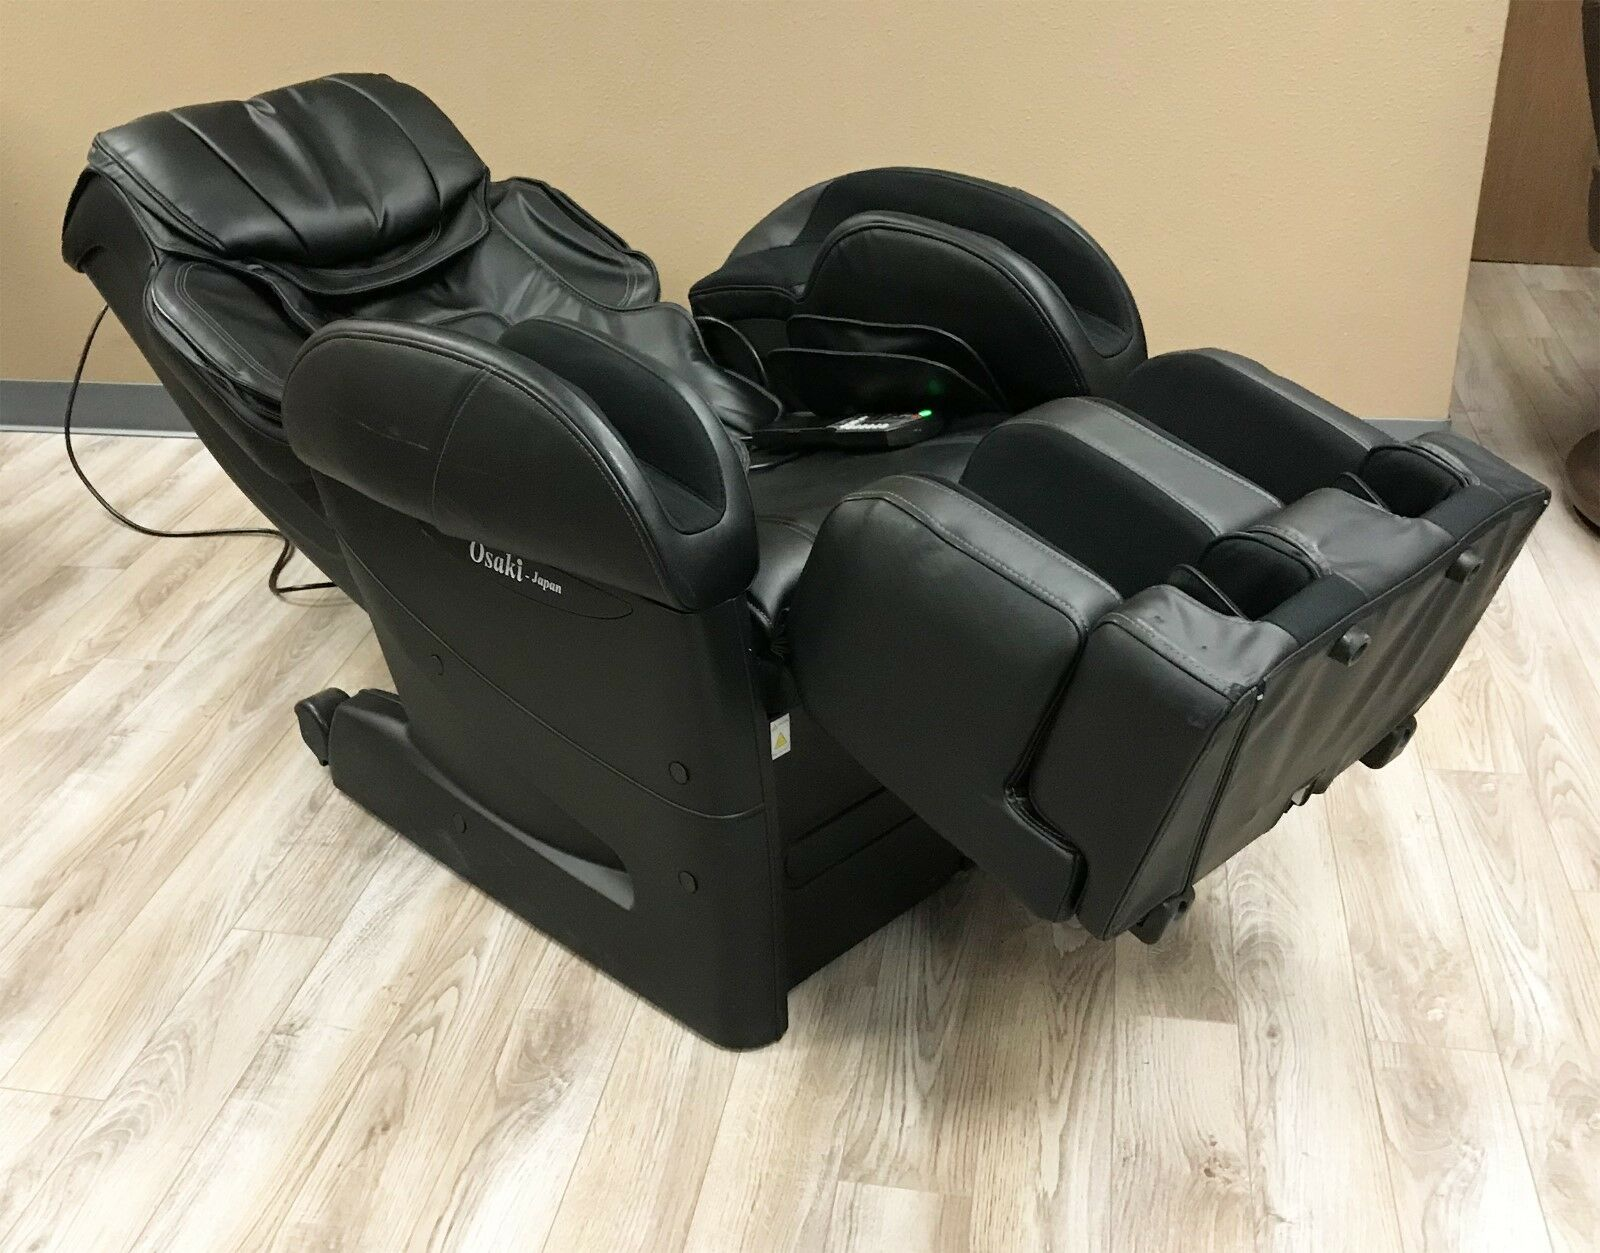 Osaki Pro Japan Premium 4d Innovation Kiwami Mecha Massage Chair